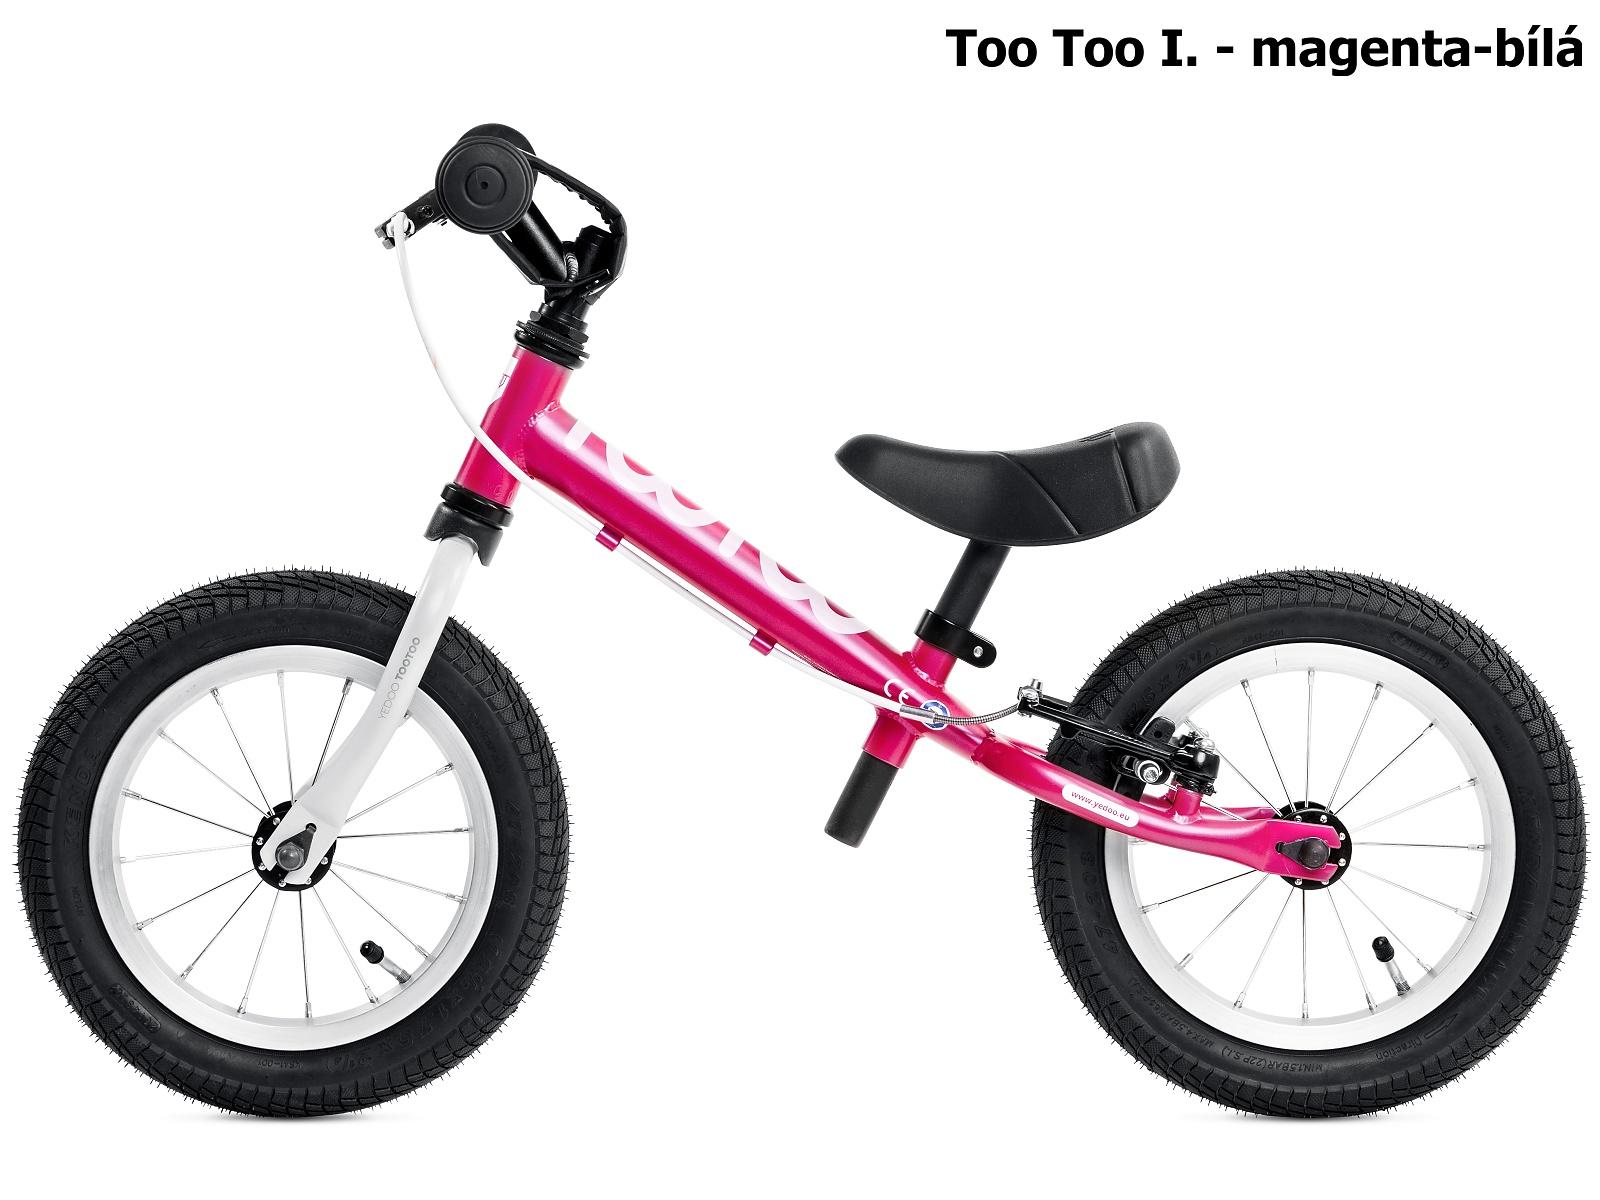 Dětské odrážedlo YEDOO Too Too I. - magenta-bílé